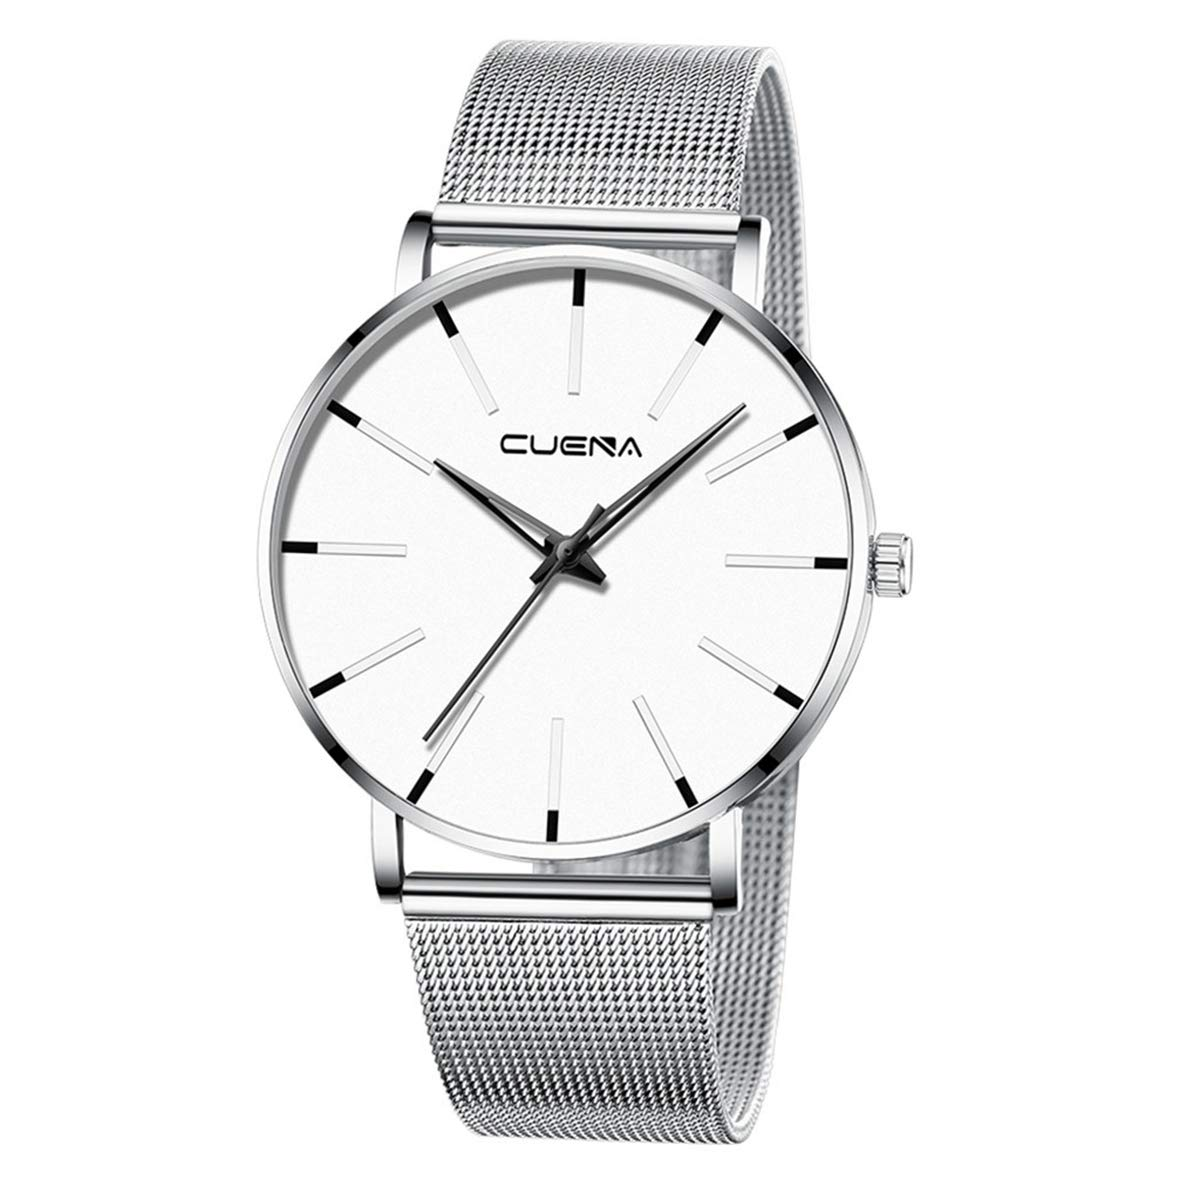 ZODRQ Men's Watch,Fashion Watches Stainless Steel Mesh Wrist Watch Casual Wristwatch Quartz Watch for Men Gift (F) by ZODRQ